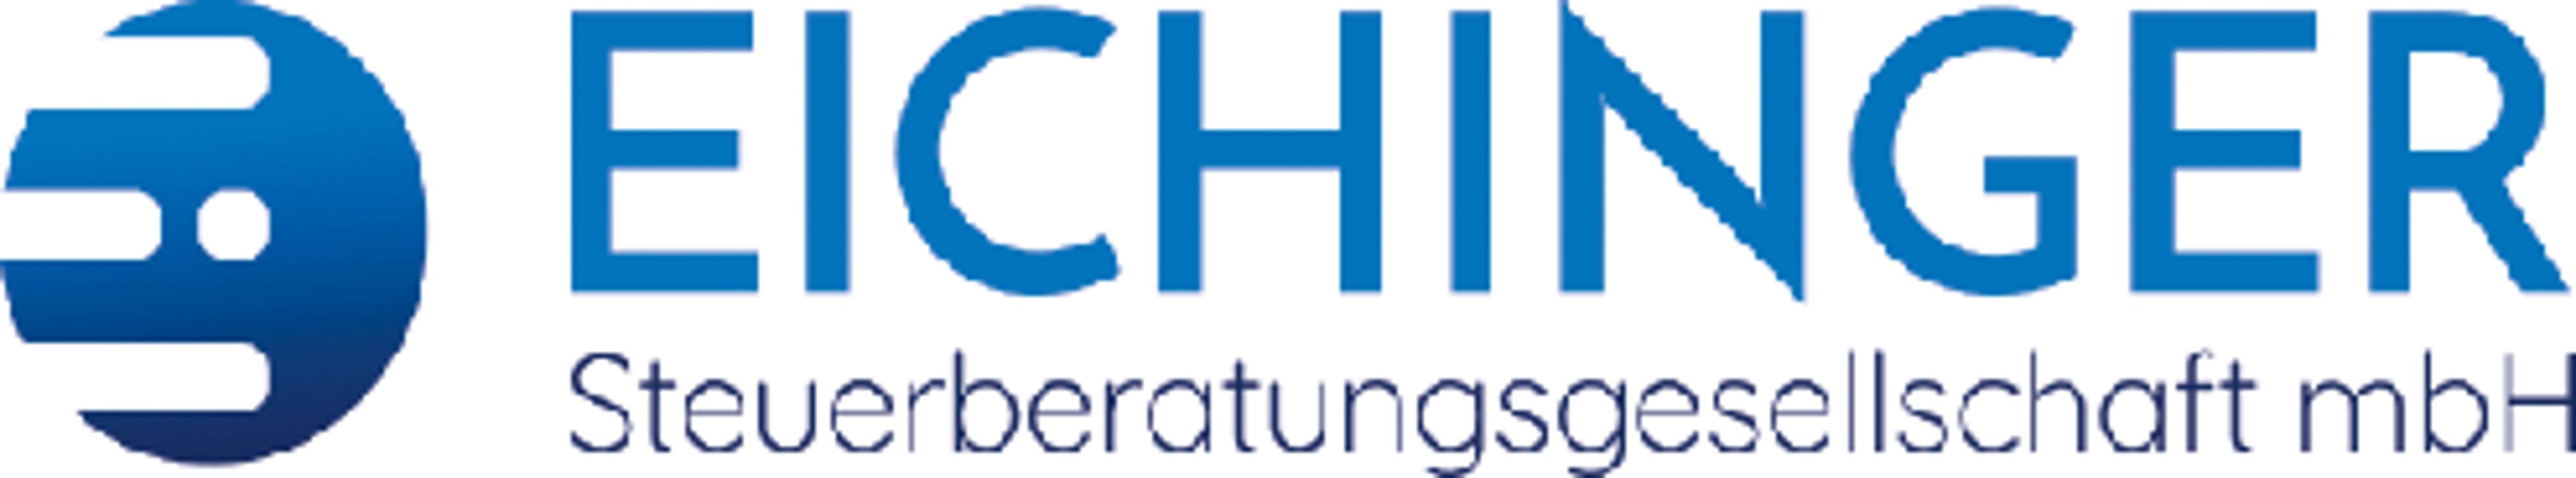 Bild zu Eichinger Steuerberatungsgesellschaft mbH in Neuötting